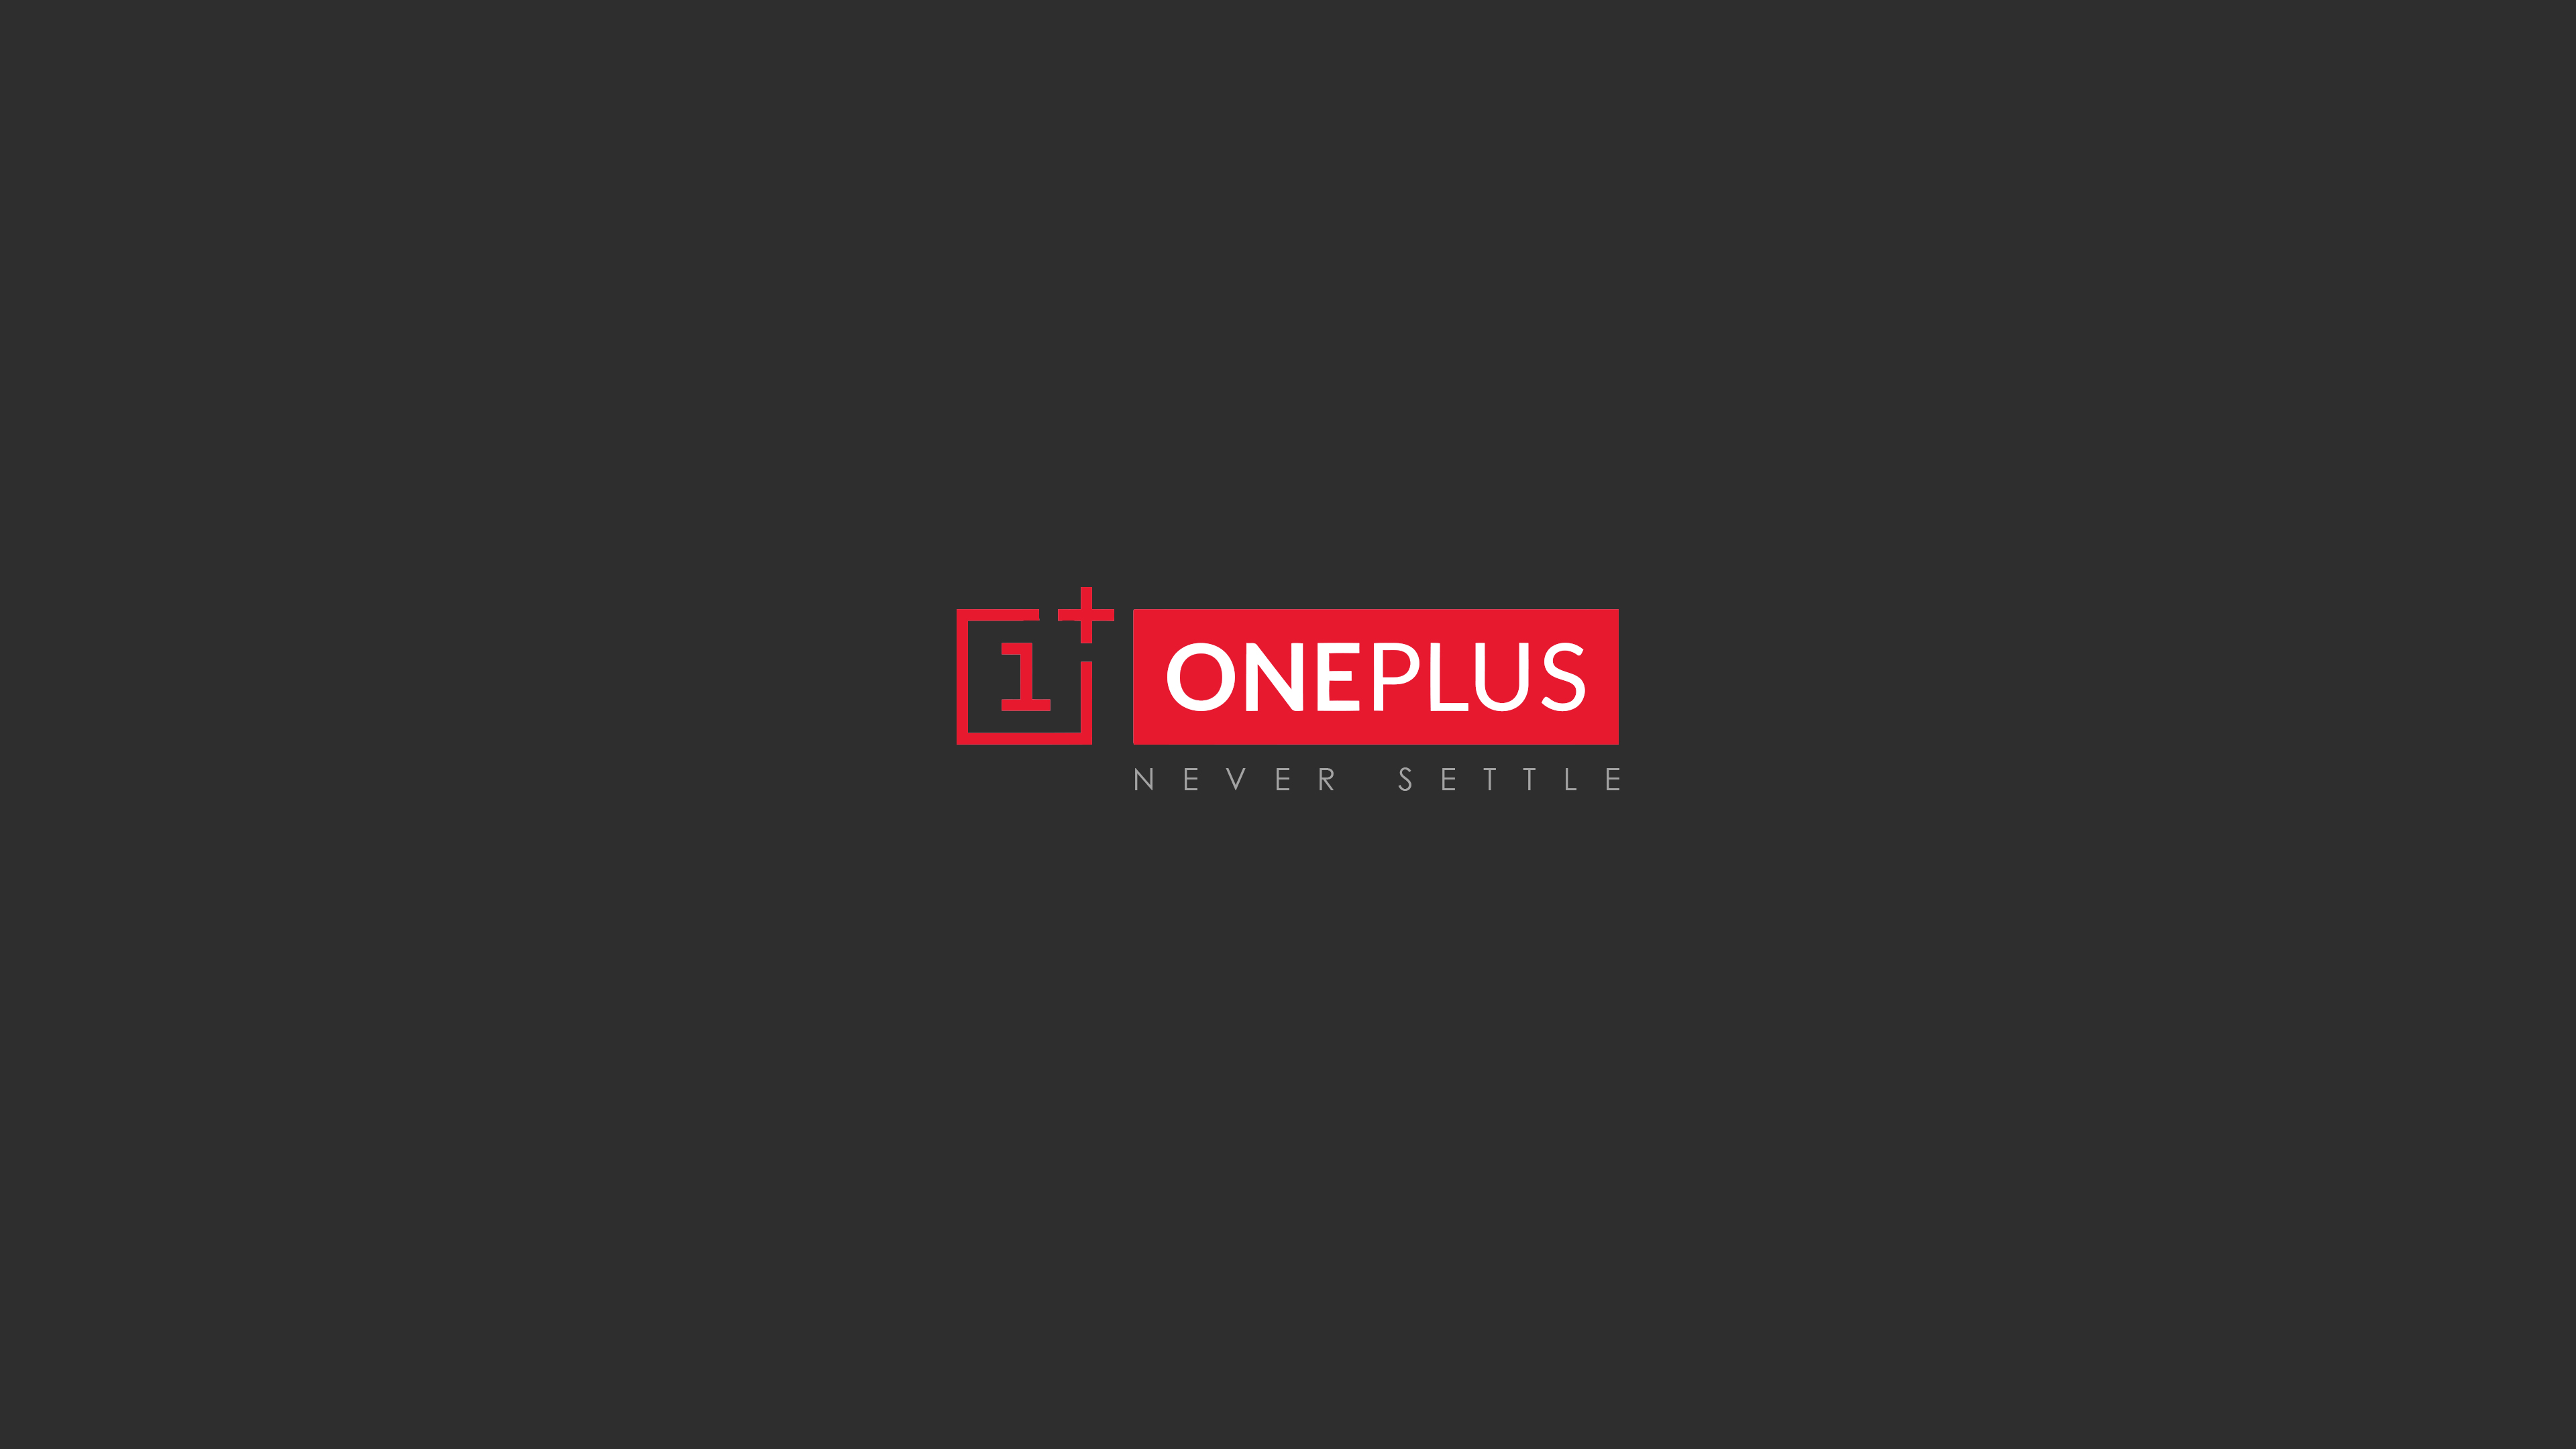 one plus never settle 4k desktop hd computer 4k